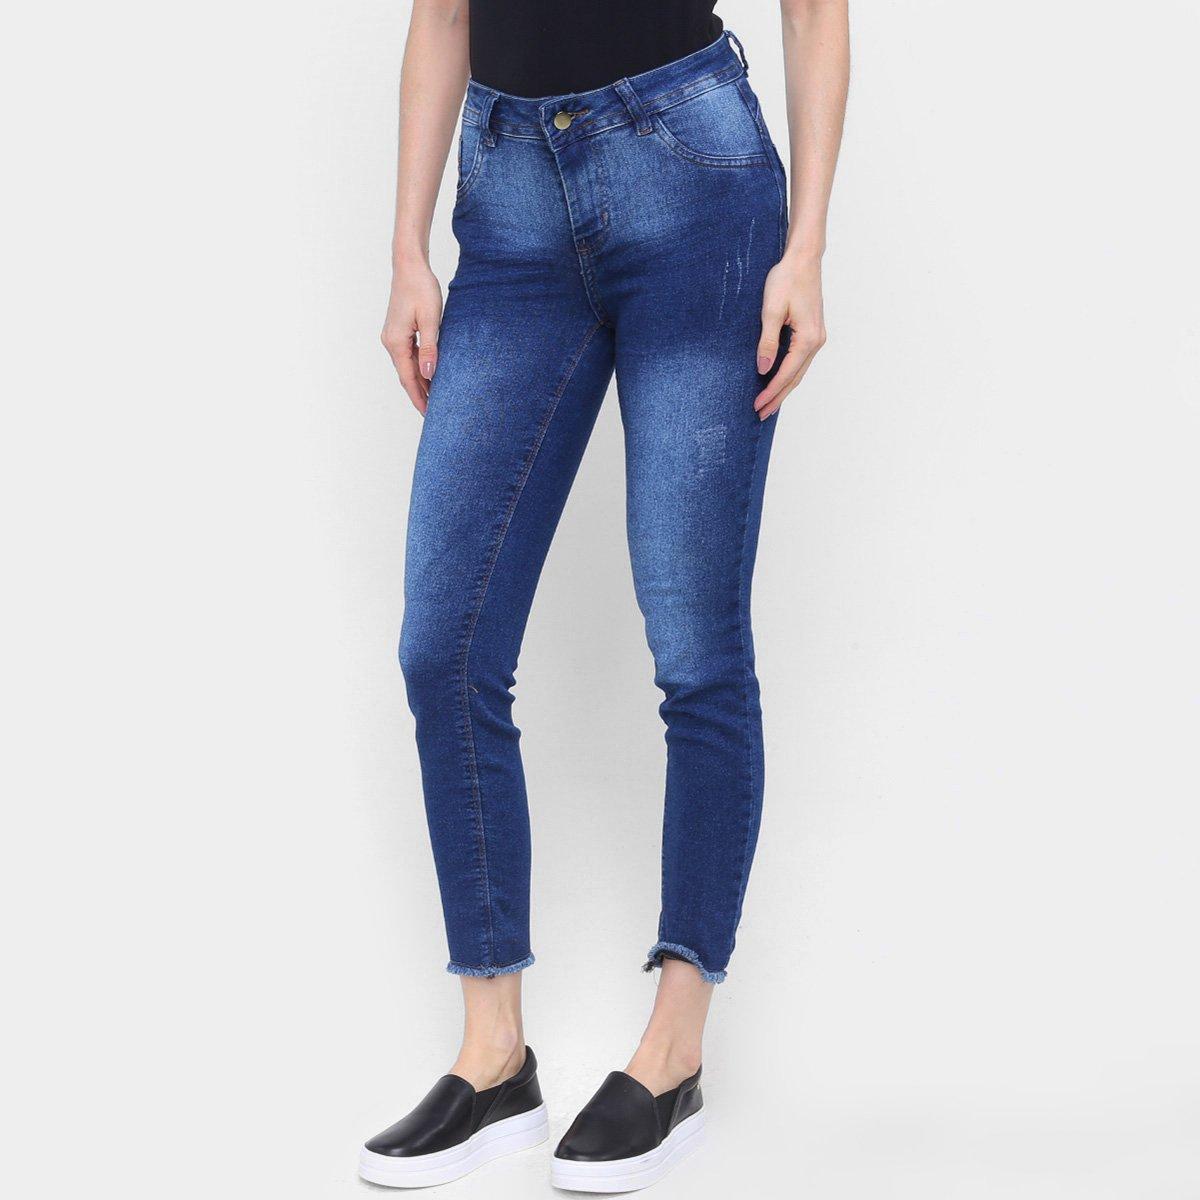 Calça Jeans Skinny Coffee Super Confort Barra Desfiada Feminina